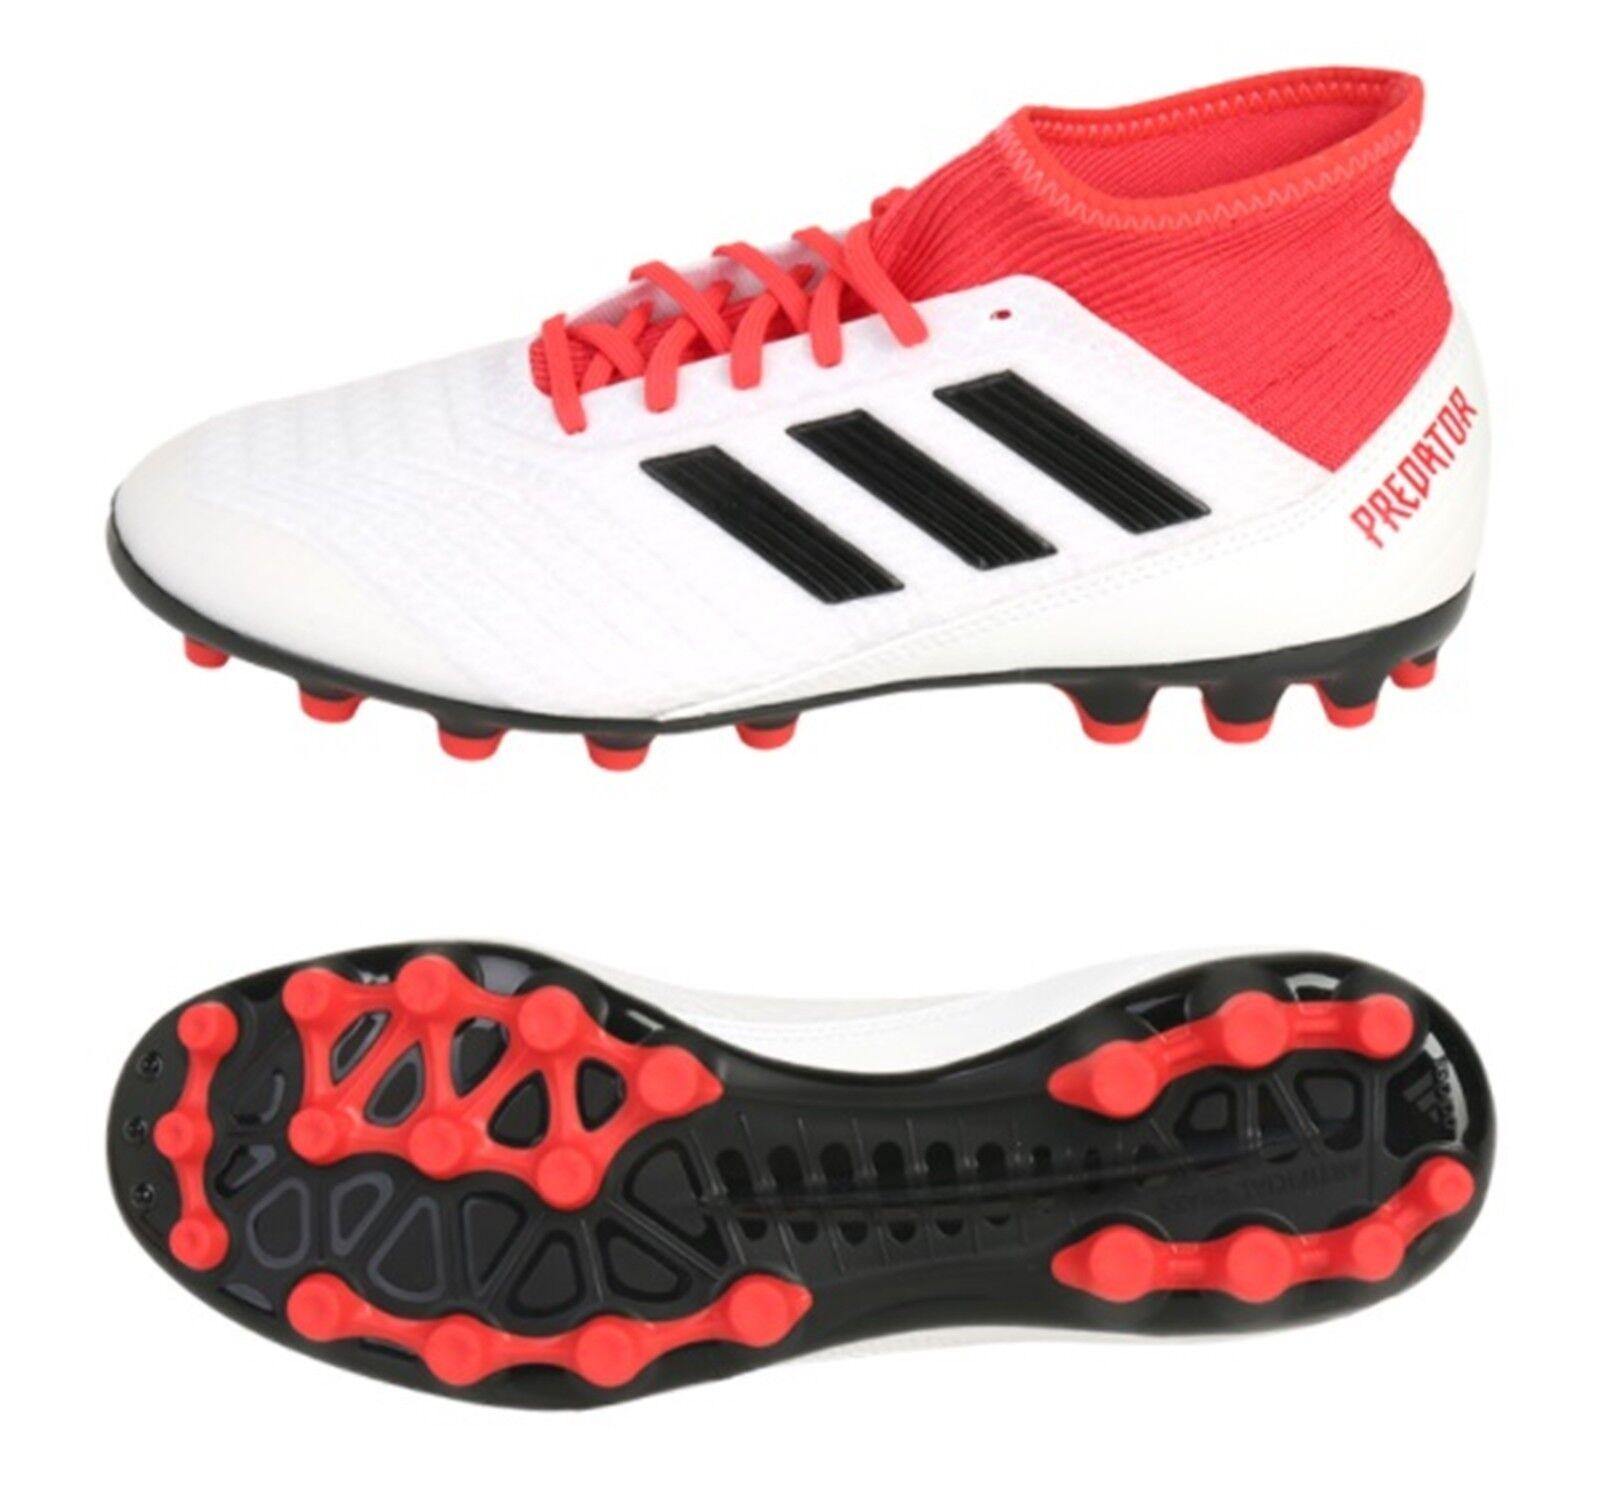 Adidas Hombres Projoator 18.3 AG Botines De Fútbol blancoo Rojo Fútbol Zapatos Spike CP9307